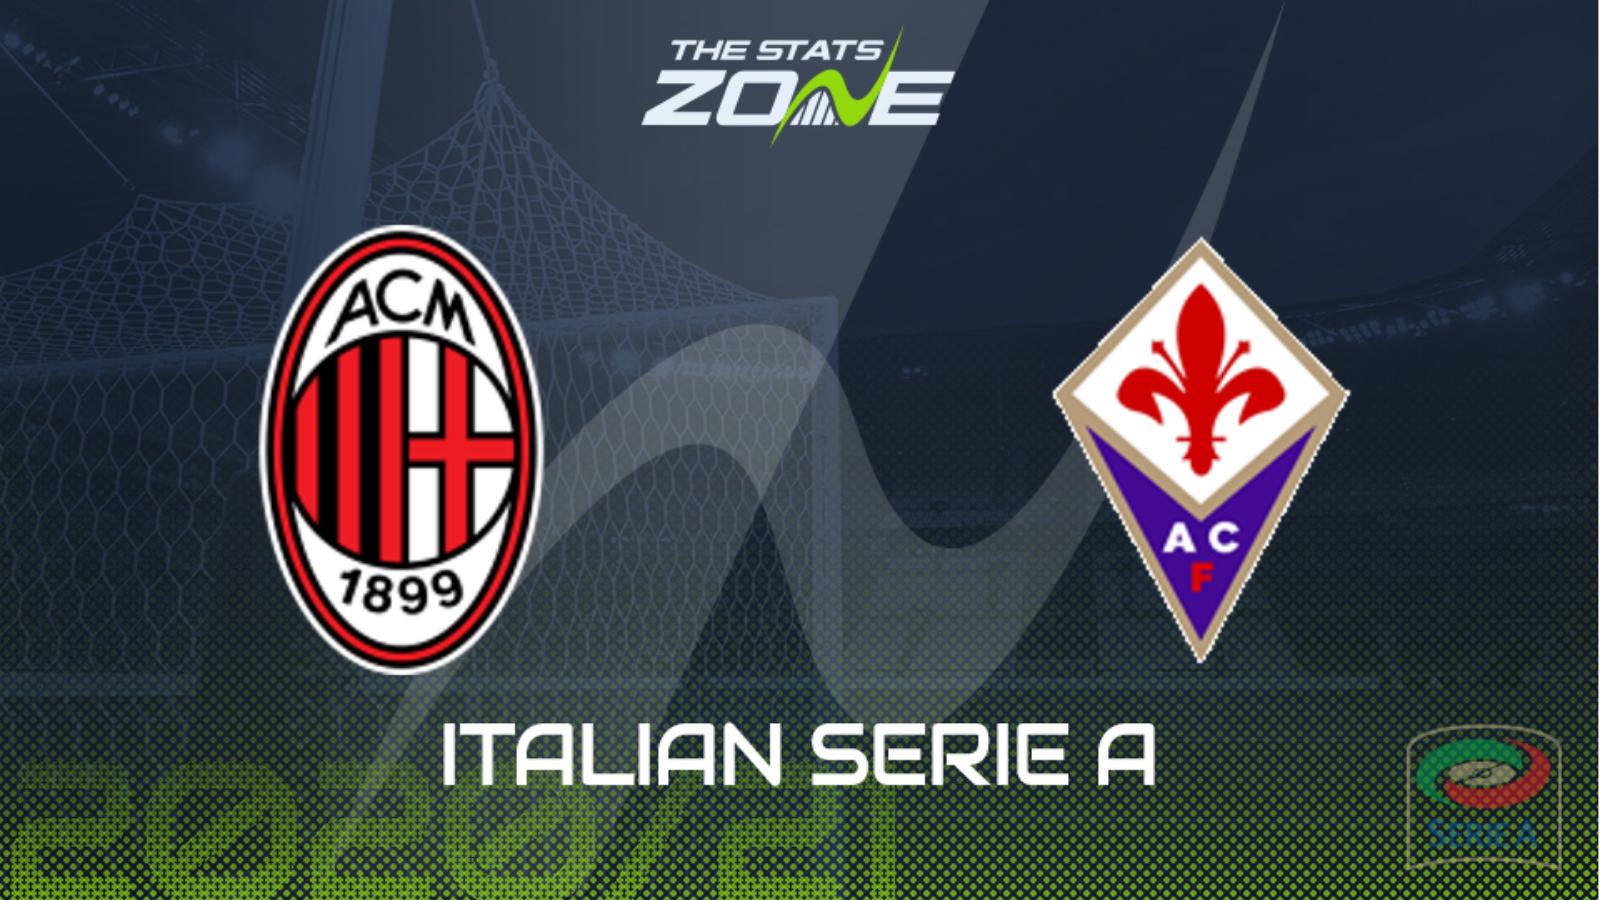 Milan vs fiorentina betting tips chicago vs dallas betting predictions soccer